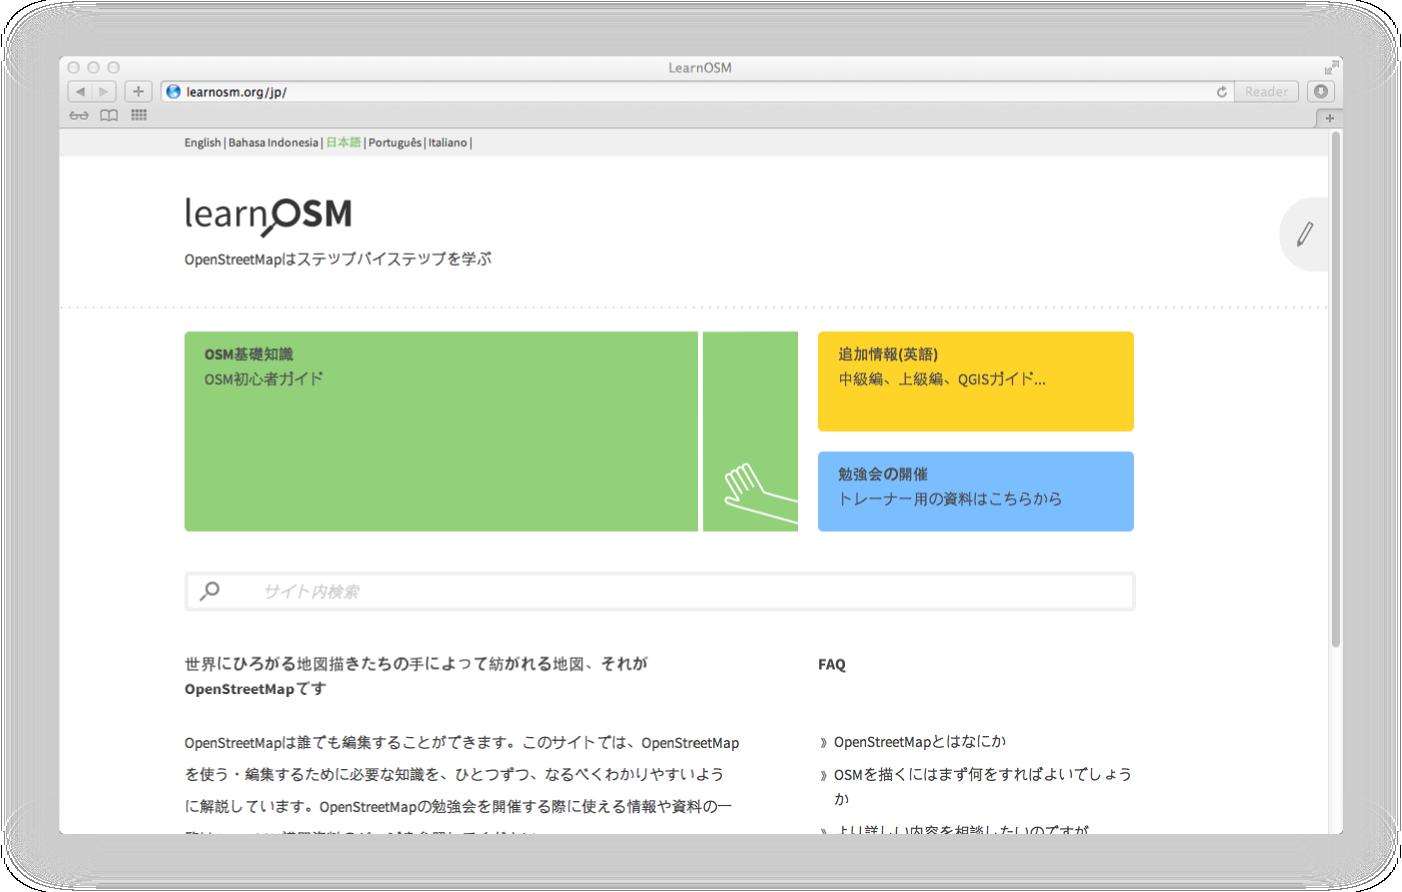 LearnOSM - Japanese